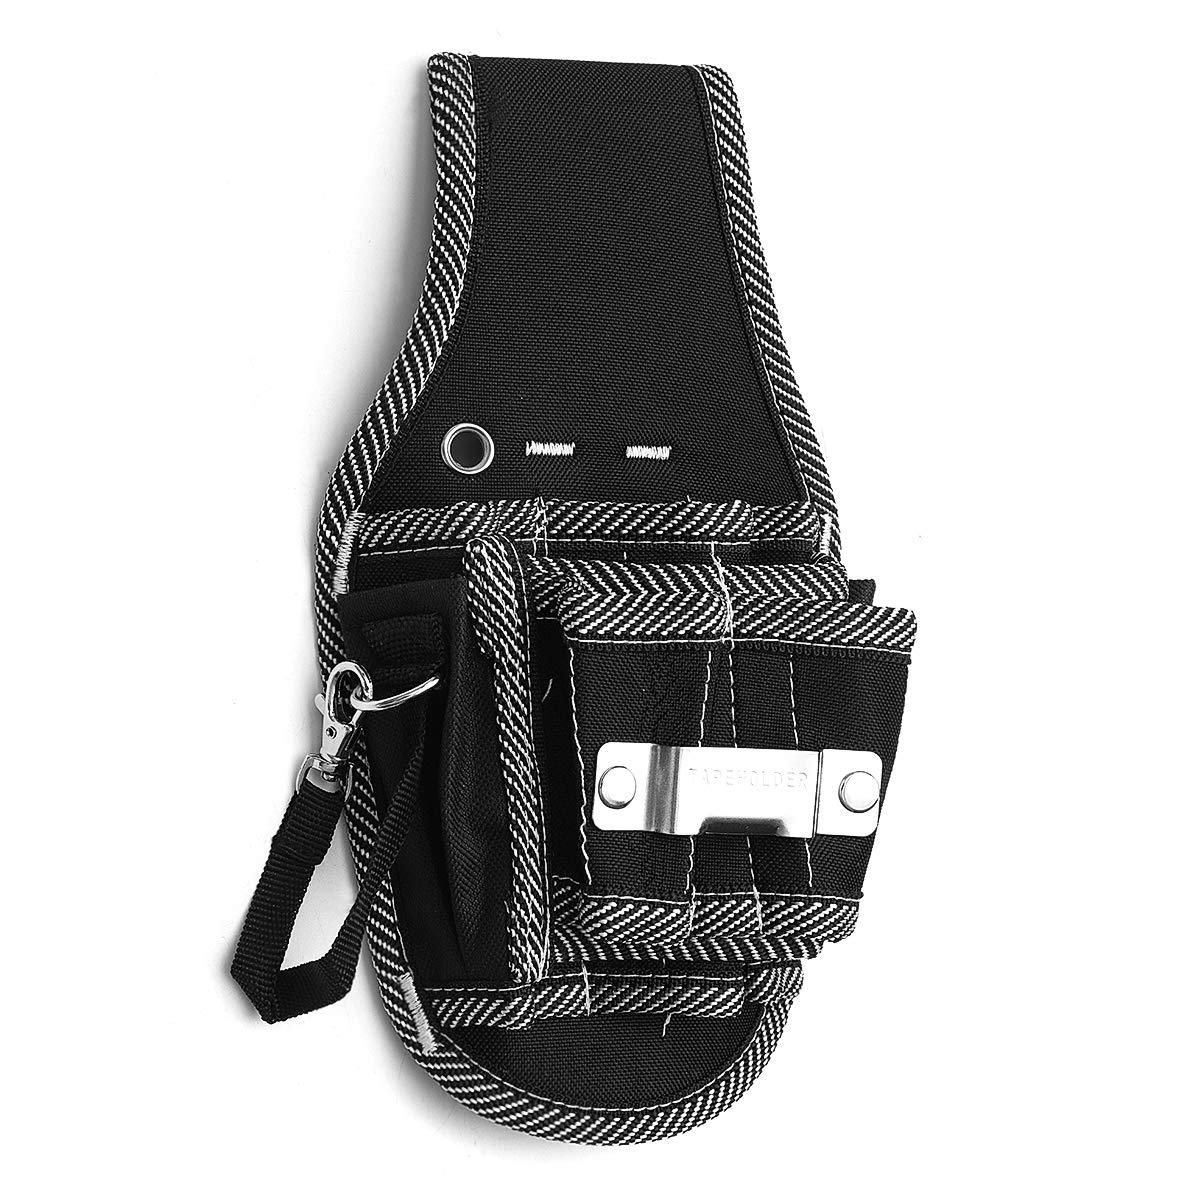 MASUNN Herramienta Multifuncional Bolsa Electrico Impermeable Oxford Herramientas Kit Bolsillos con Cintur/ón De Cintura